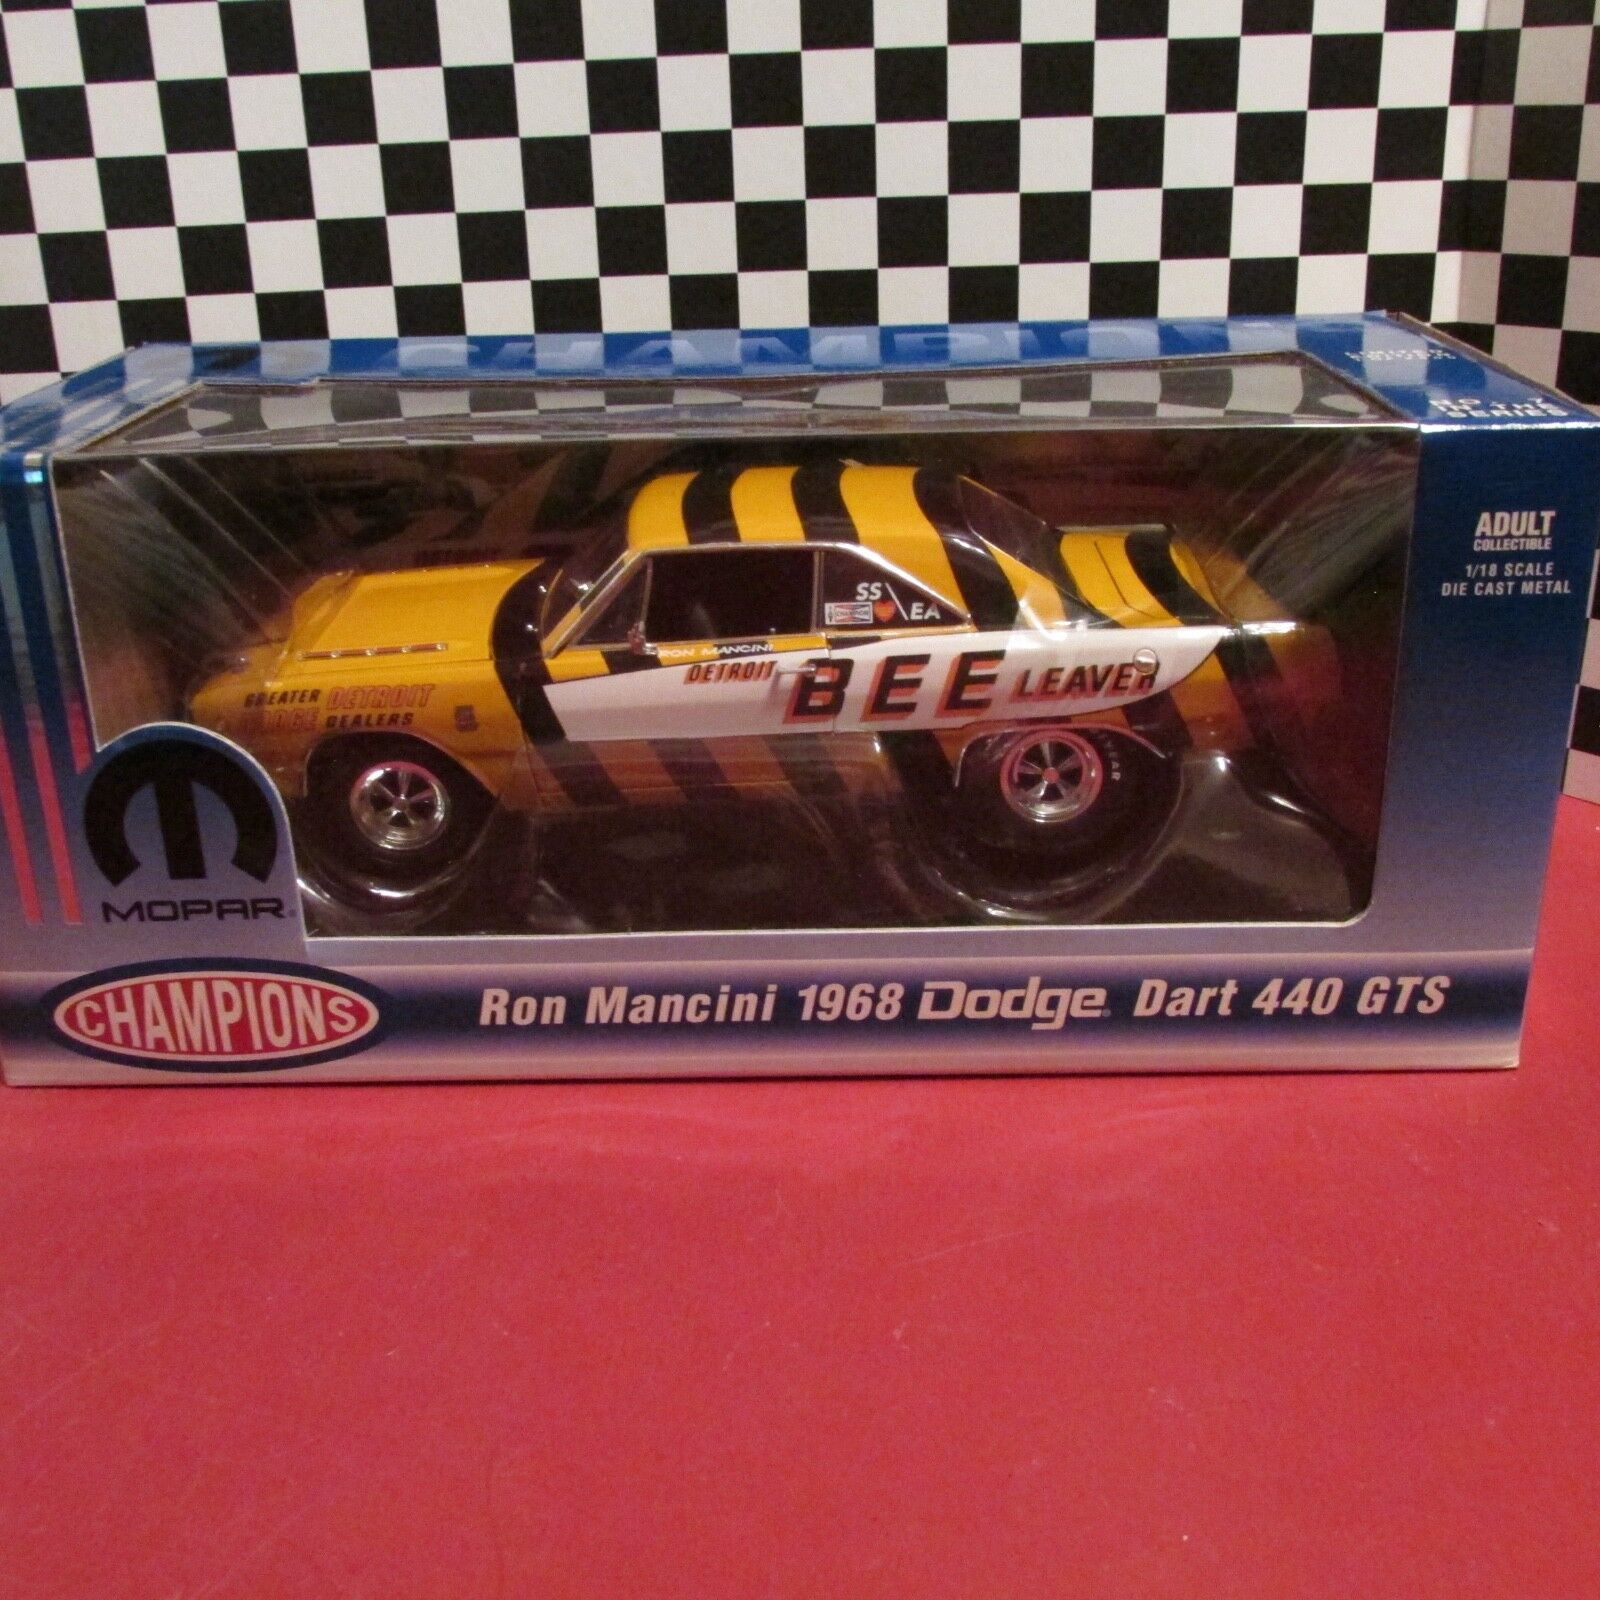 Ertl,DCP,1968 Dodge Dart,440 GTS, Ron Mancini 1:18 scale diecast model,LE,1/2500